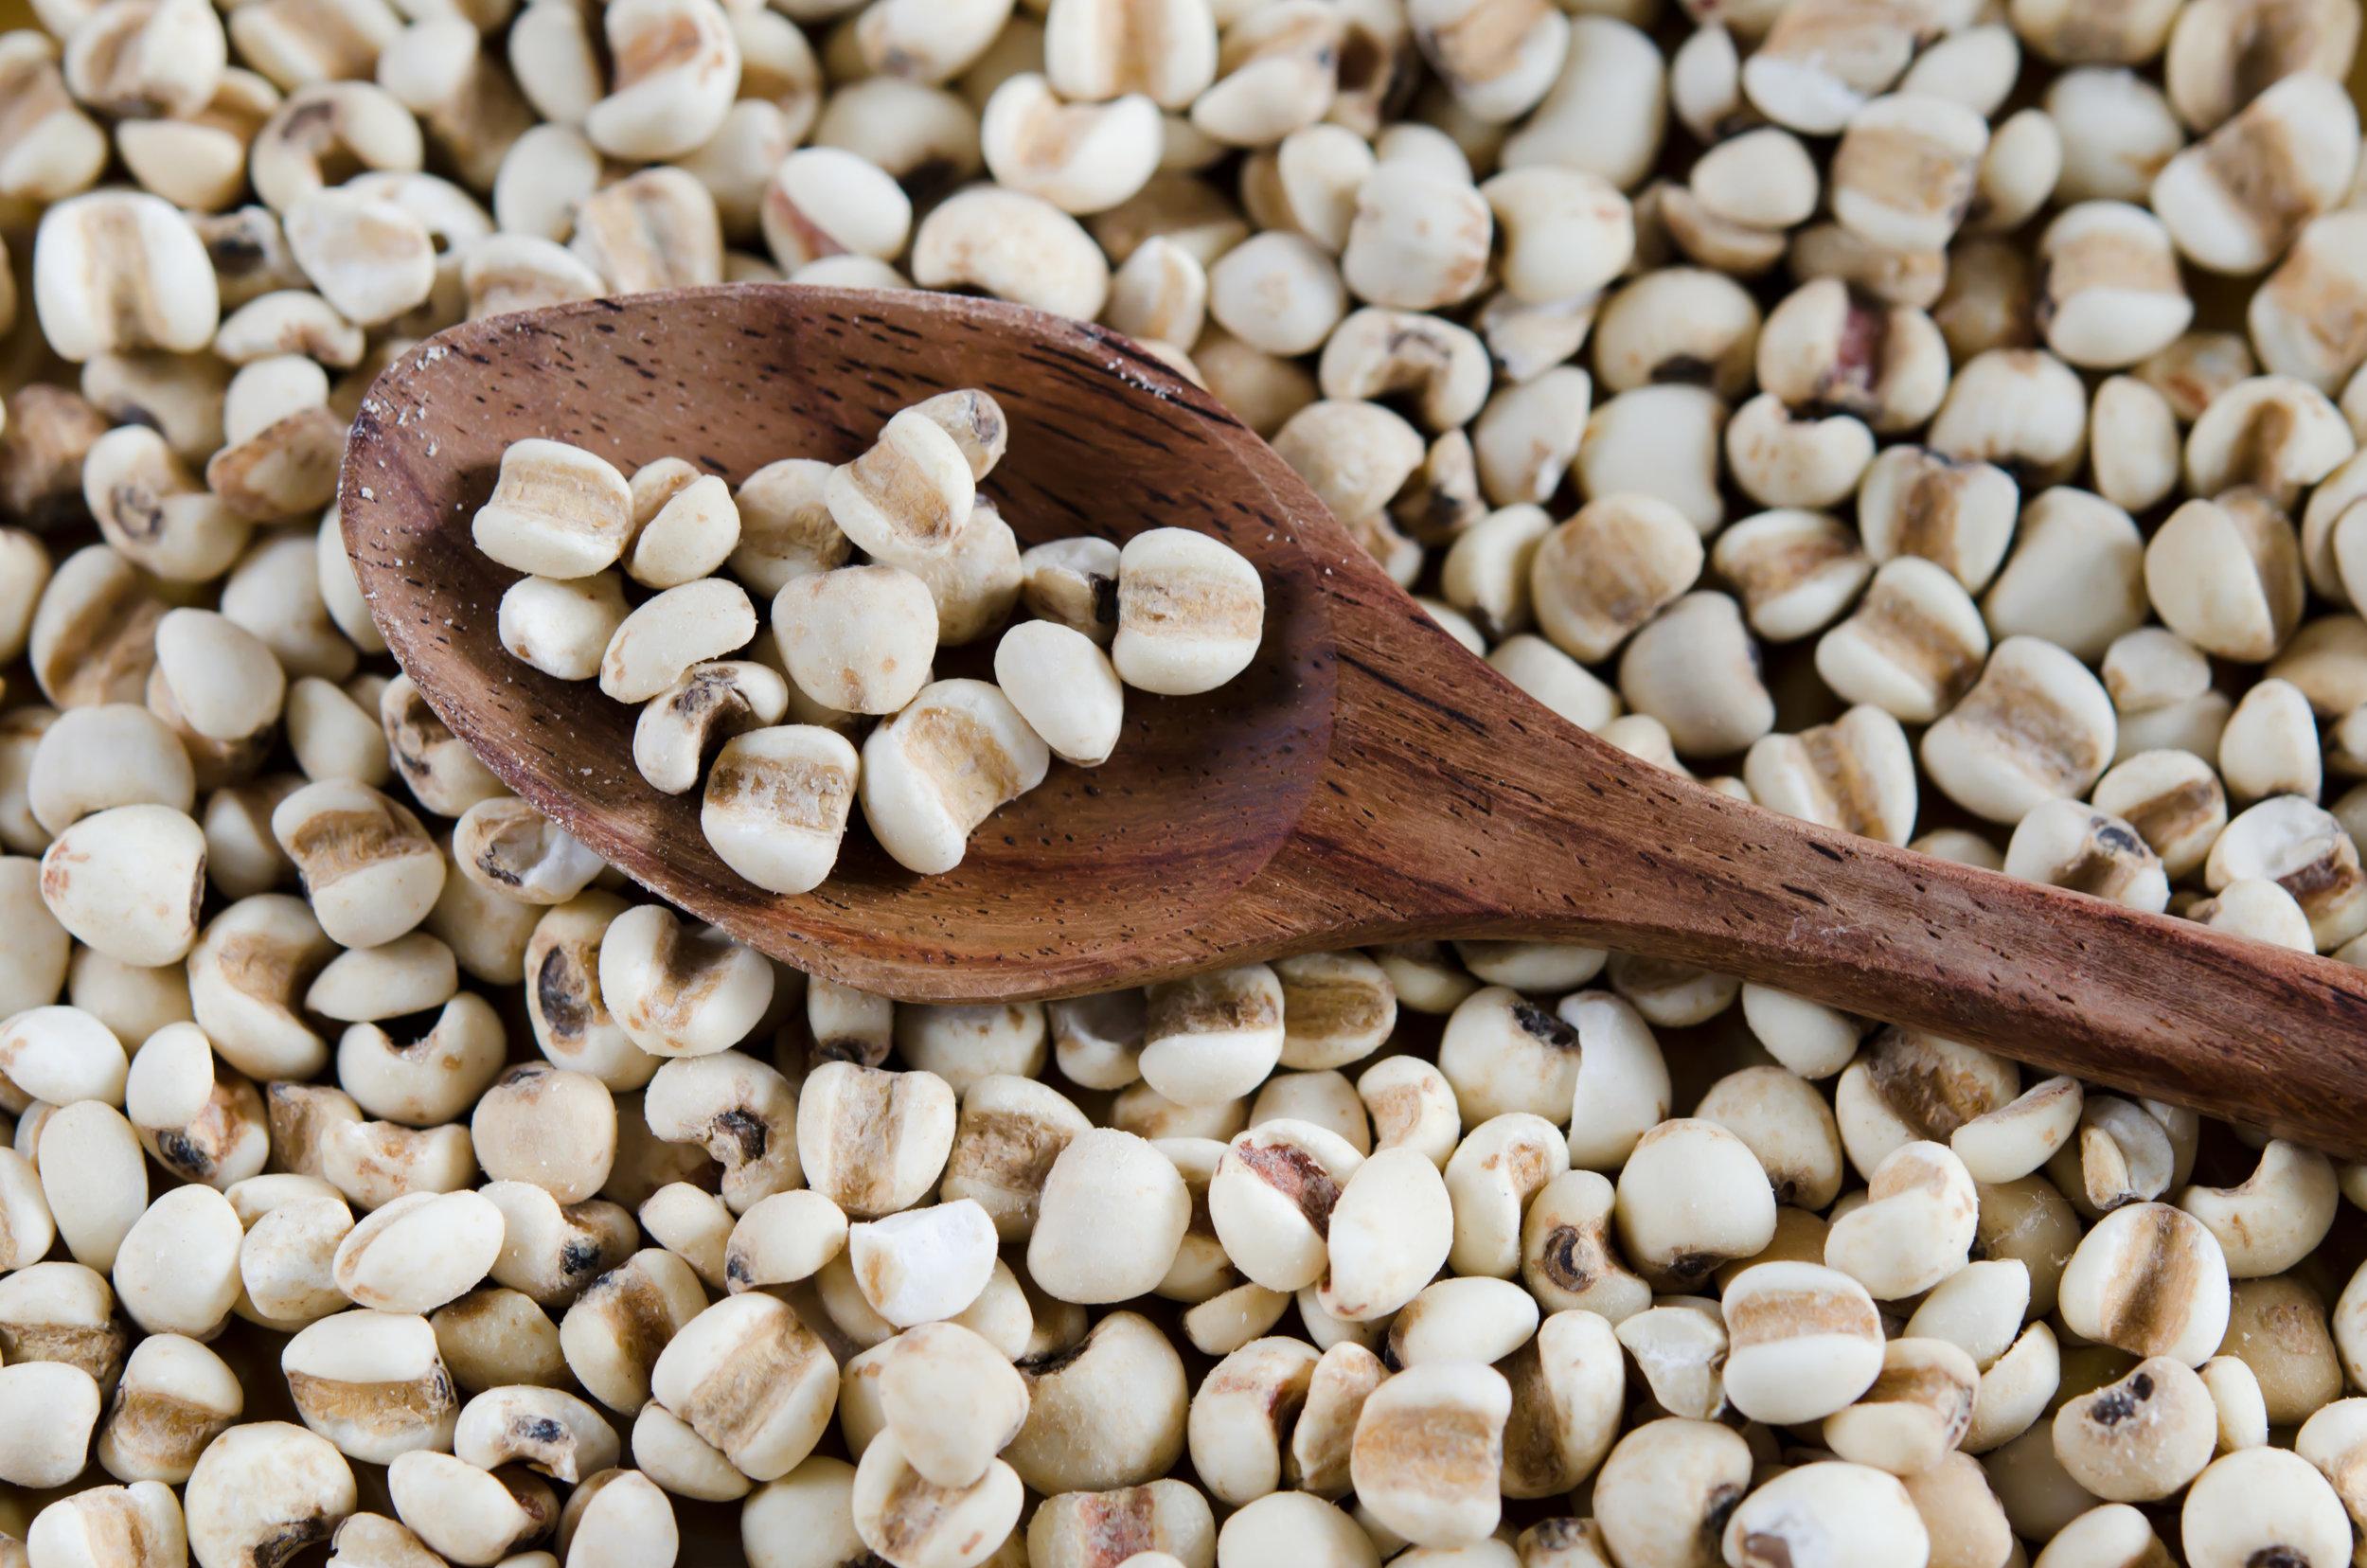 chinese-pearl--barley-on-spoon-000022473937_Full.jpg